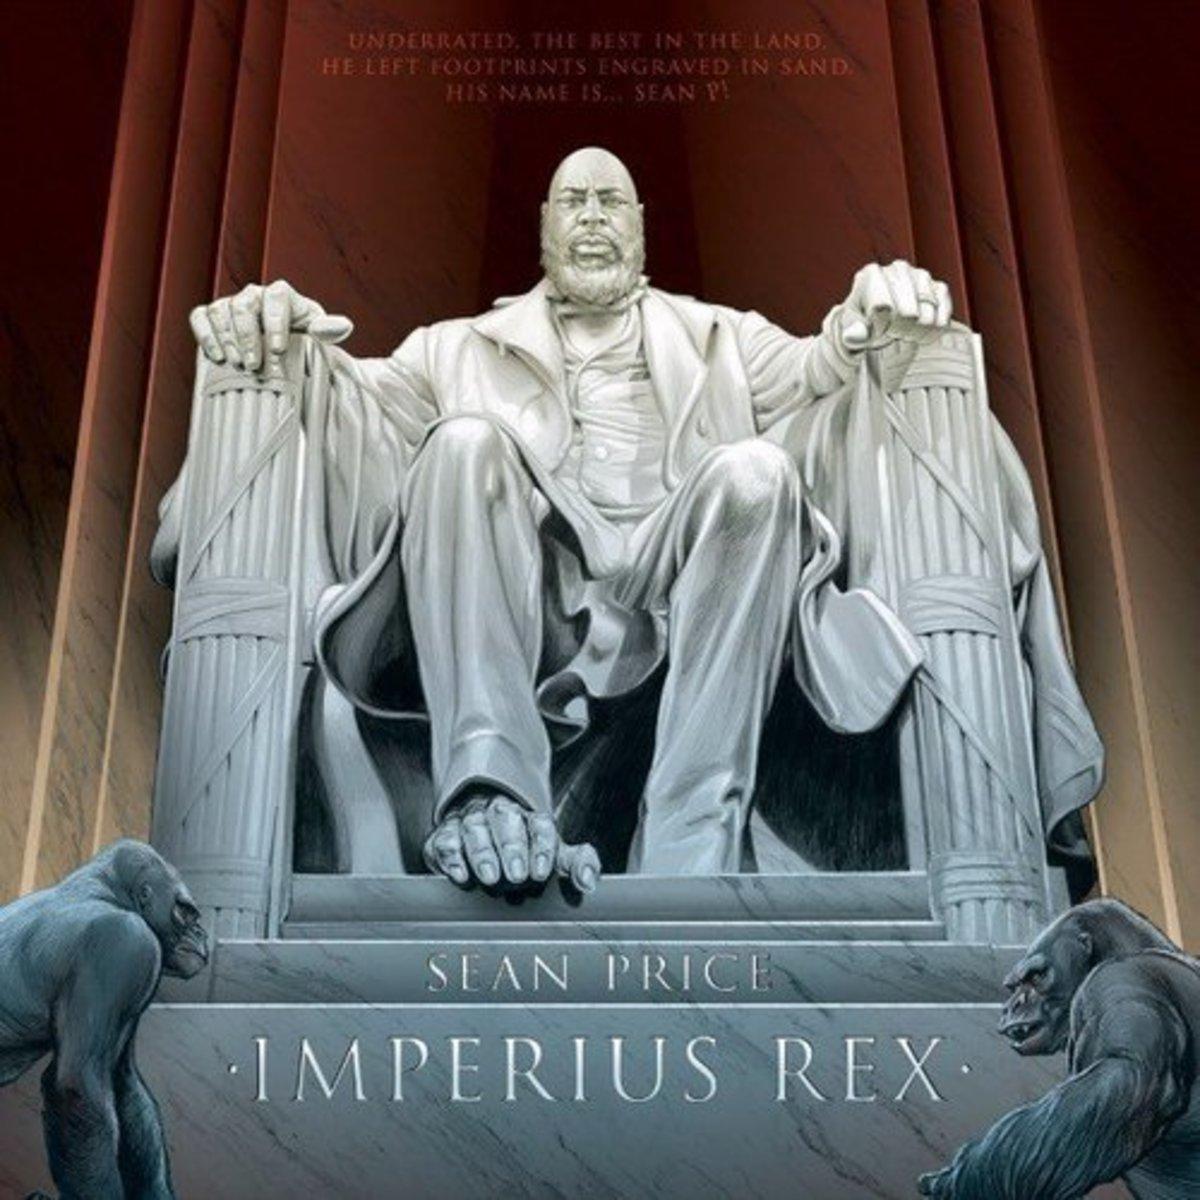 sean-price-imperius-rex.jpg